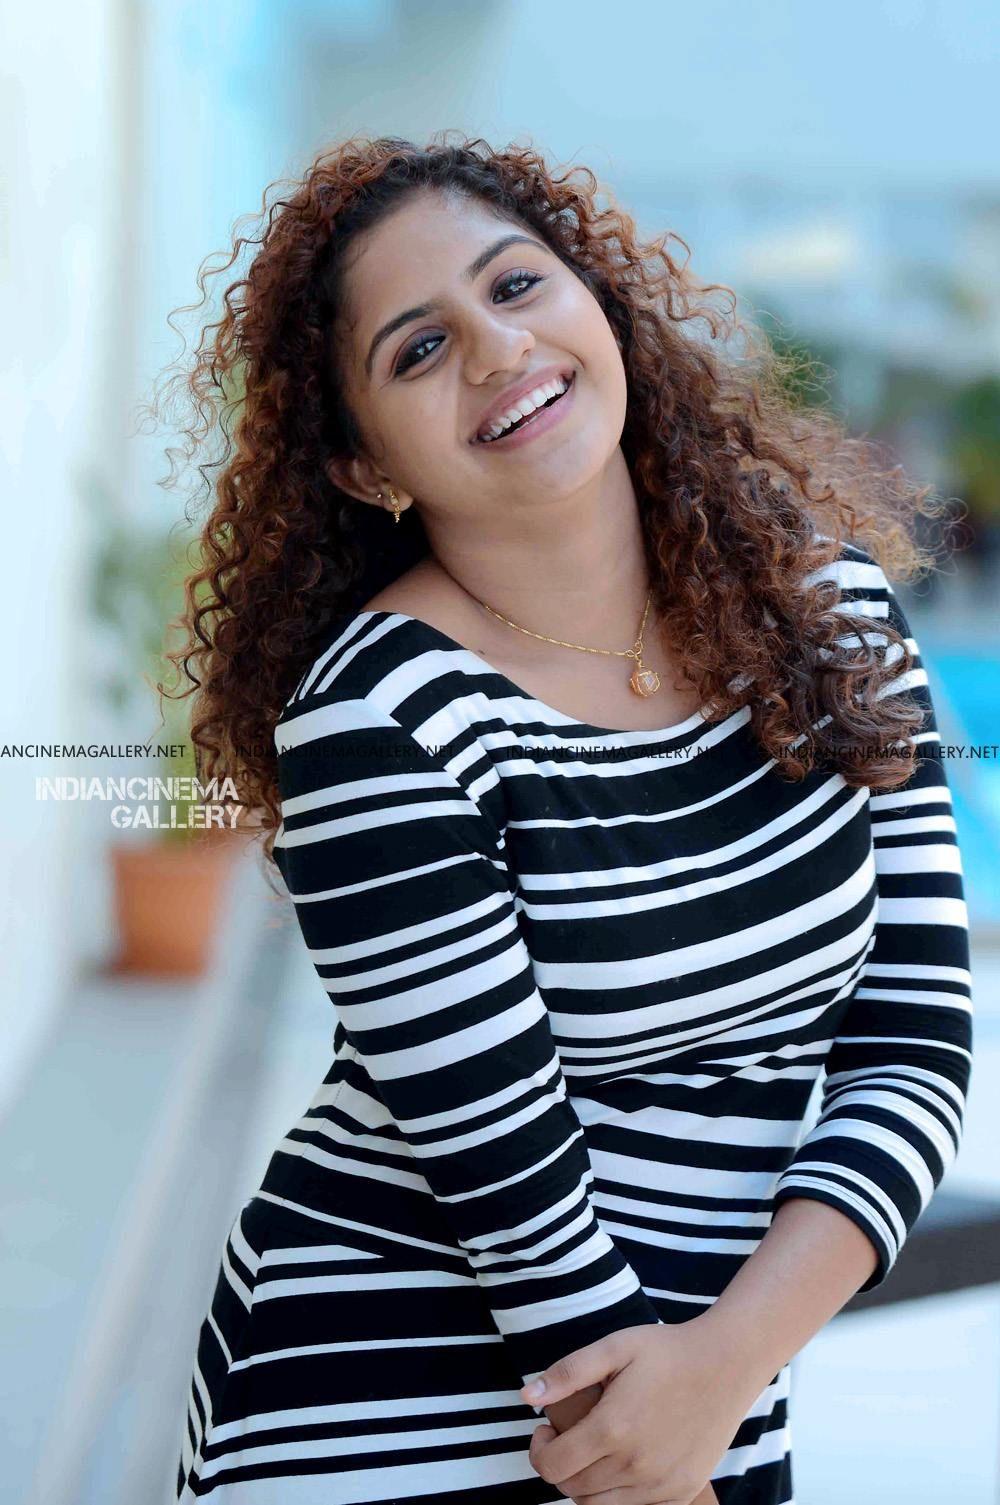 Noorin Shereef Photo Shoot March 2019 3 Stylish Girl Images Beautiful Indian Actress Indian Actress Photos